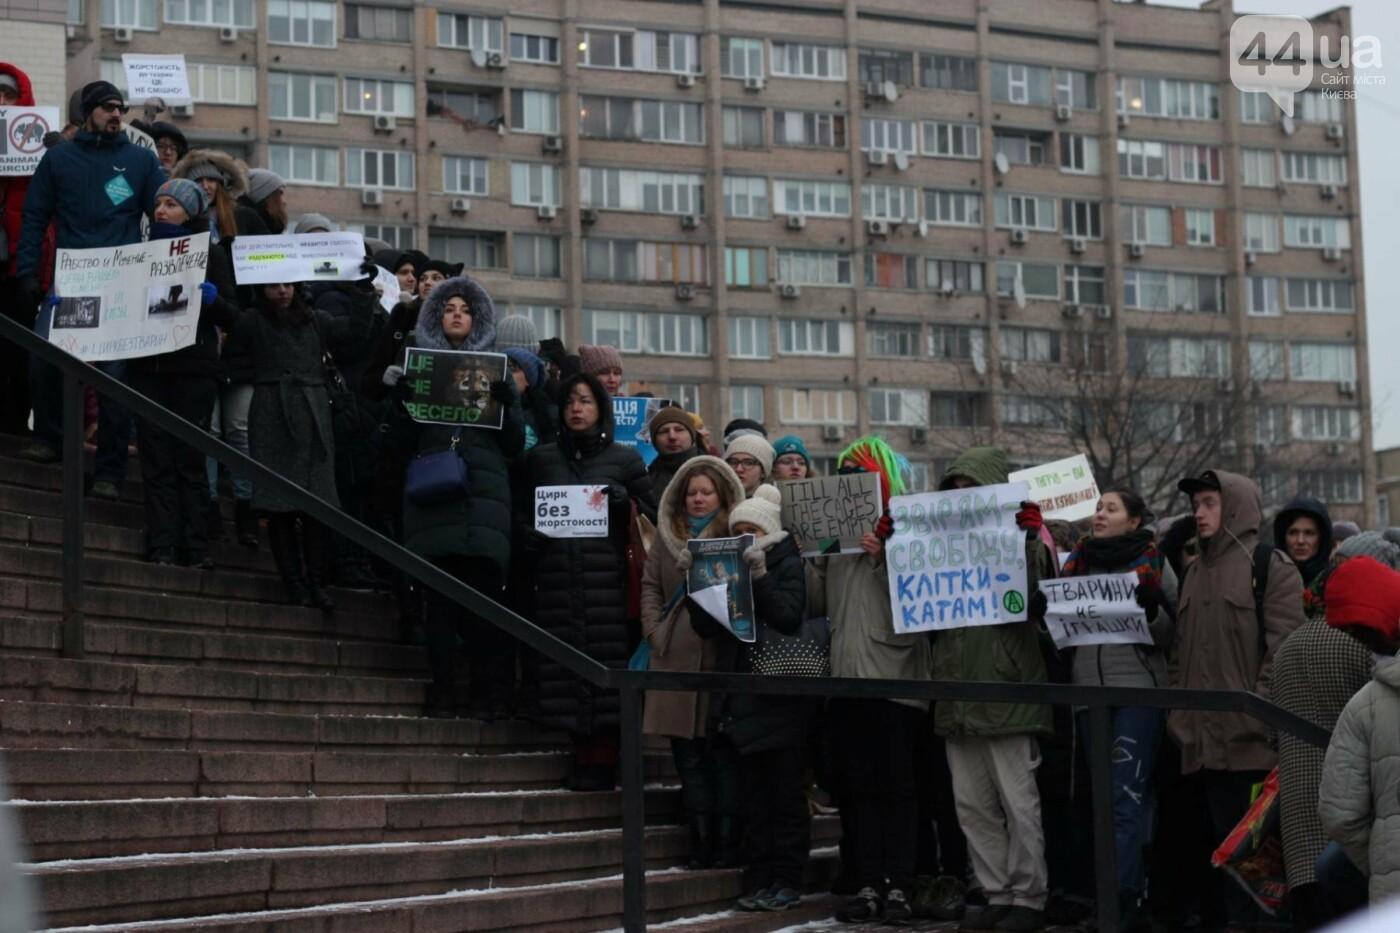 Цирк без животных: как в Киеве прошла акция протеста, фото-39